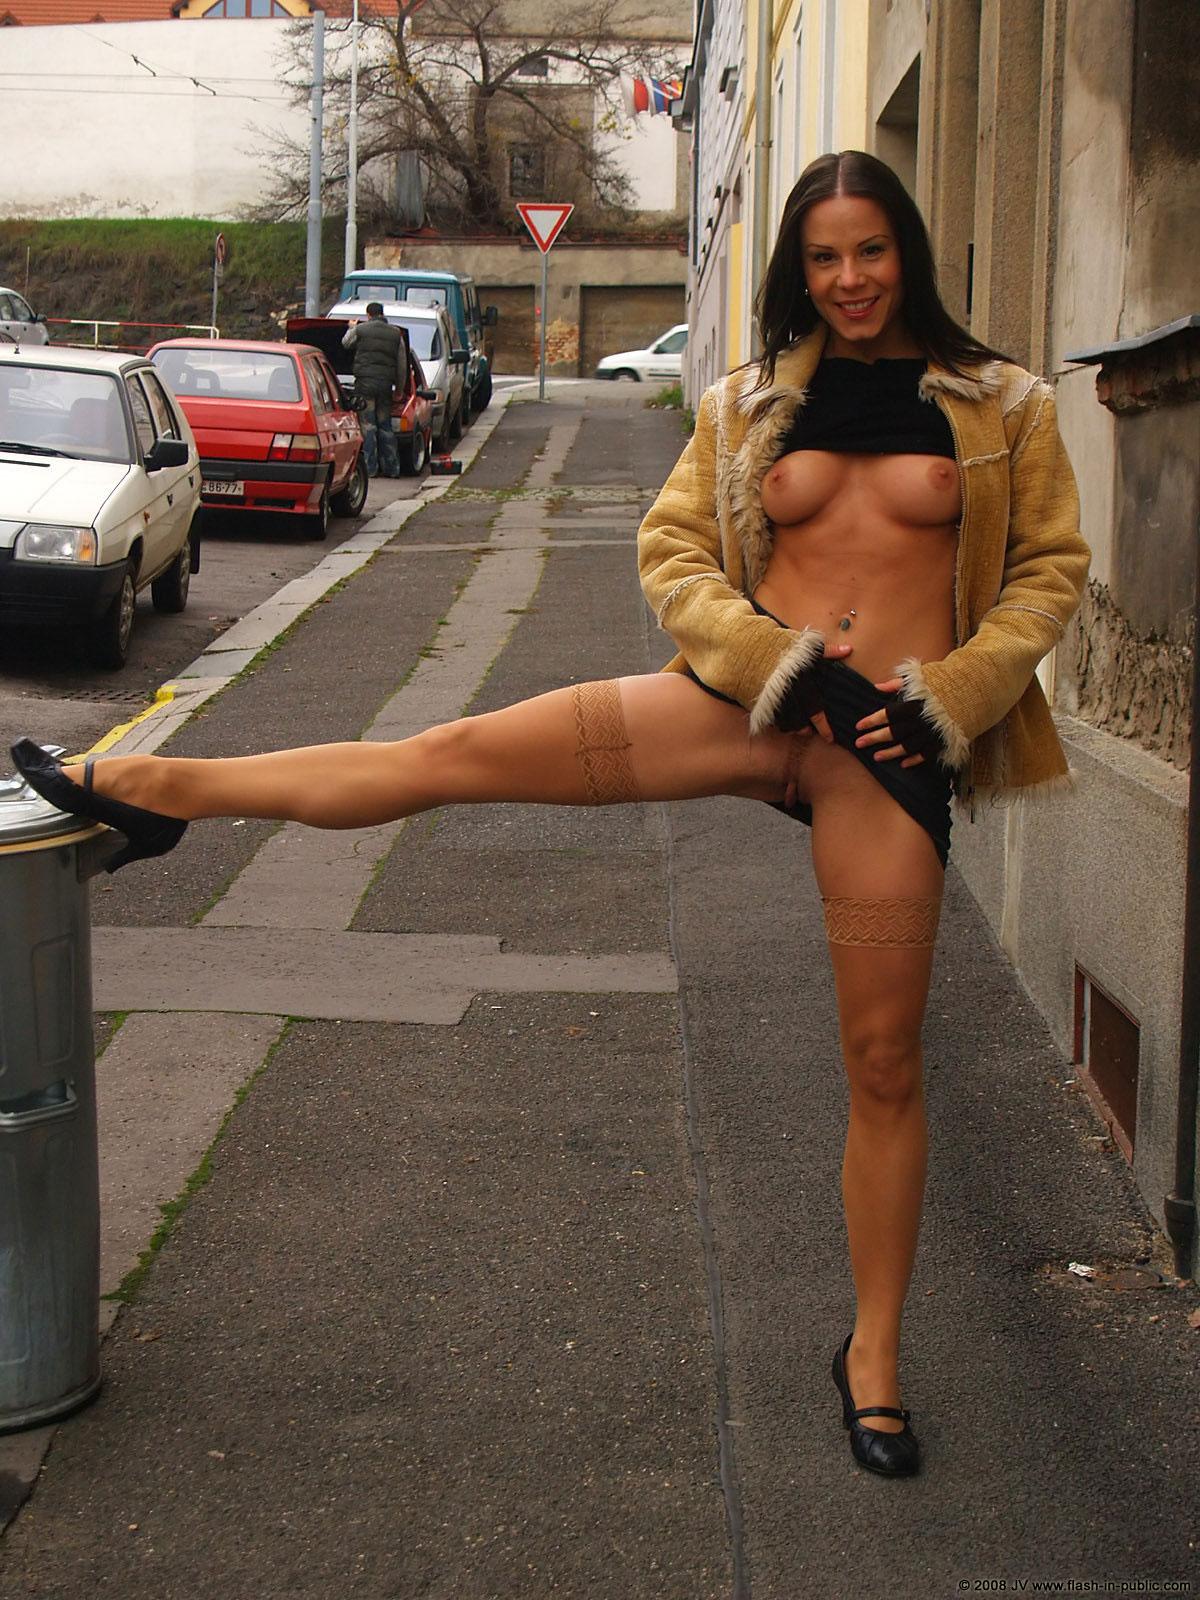 alexandra-g-bottomless-stockings-flash-in-public-30